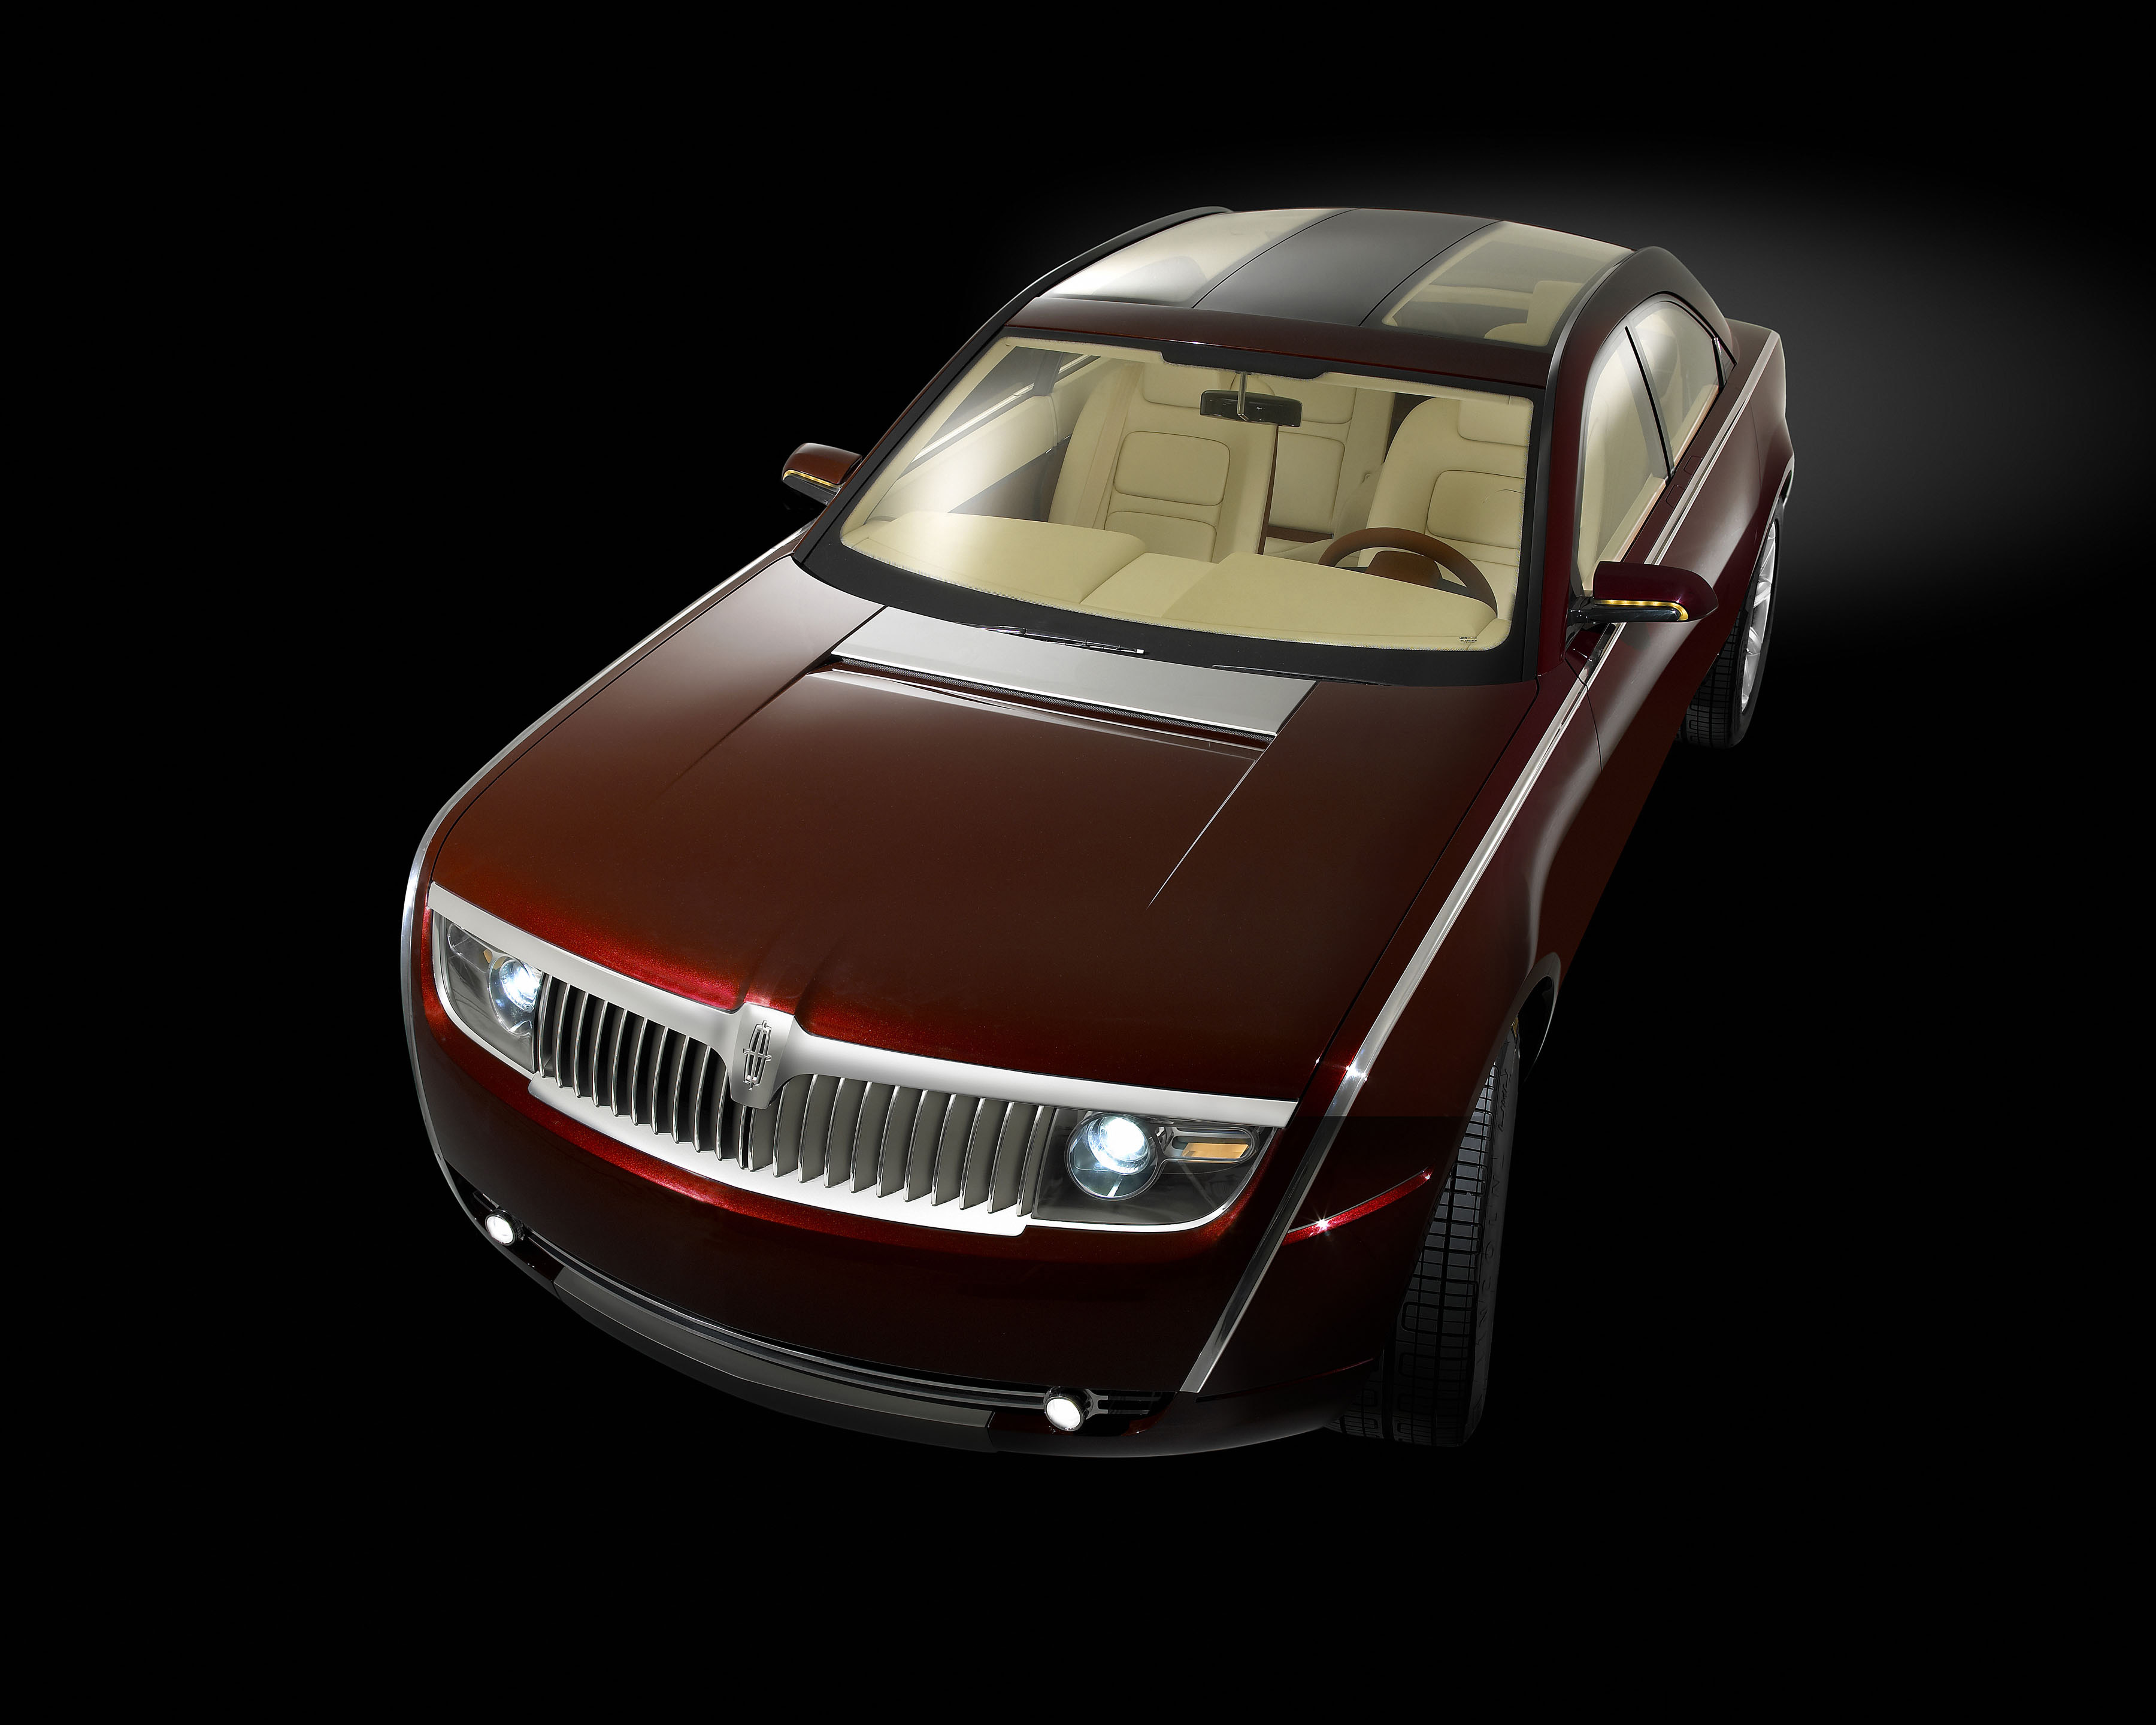 https://www.automobilesreview.com/gallery/navicross-concept/lincoln-navicross-concept-12.jpg